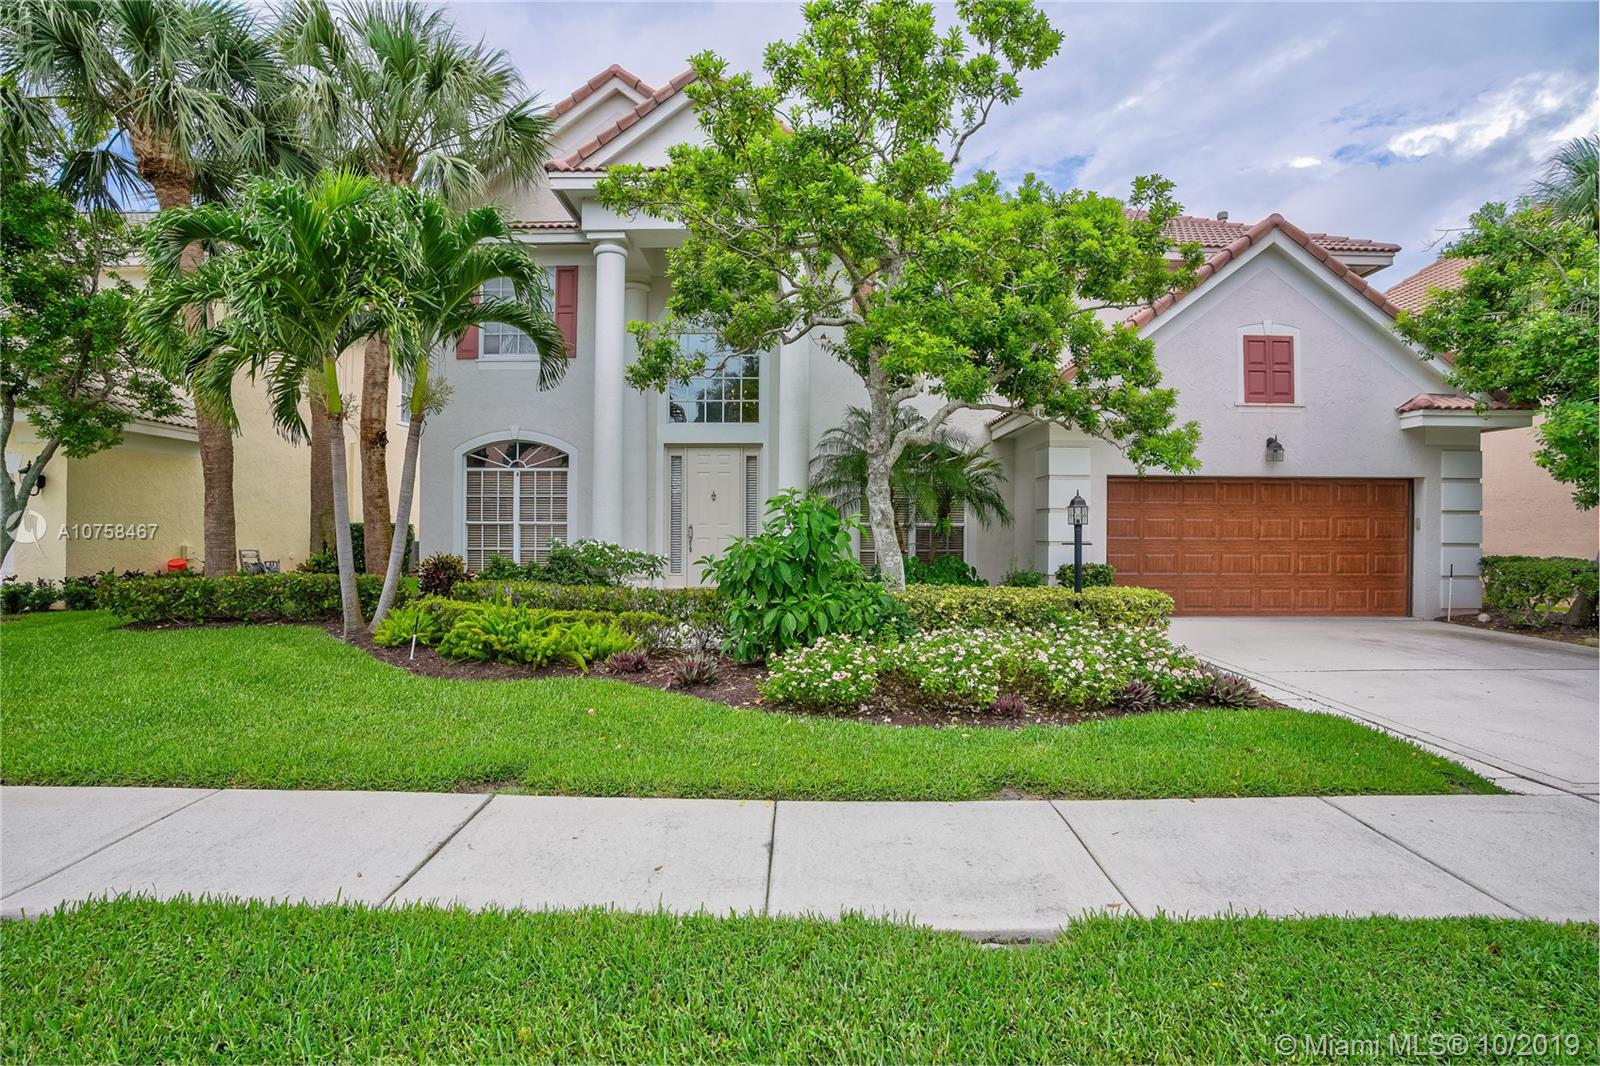 161 Oakwood Ln, Palm Beach Gardens, FL 33410